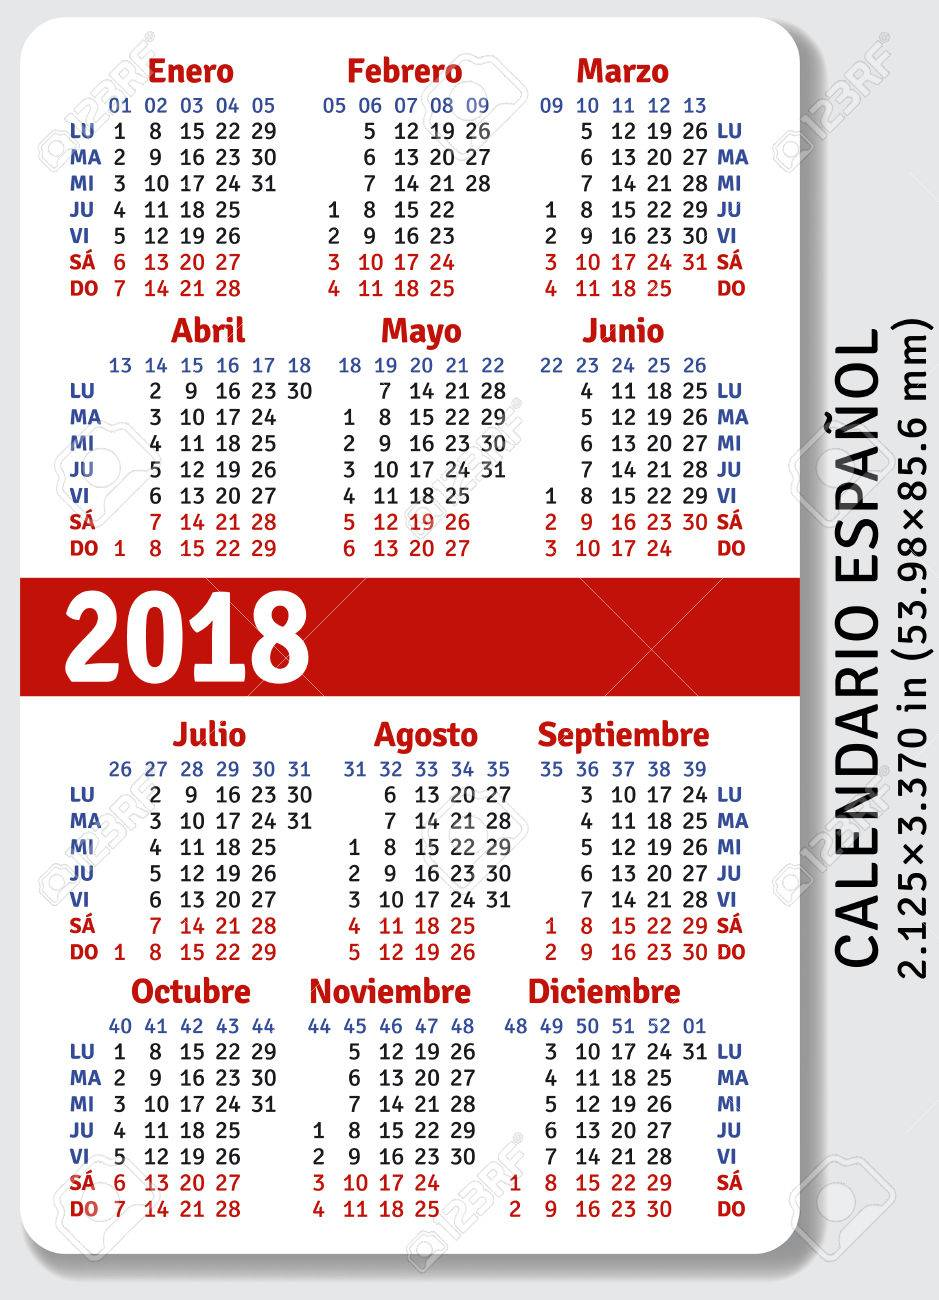 Pocket Calendar.Spanish Pocket Calendar For 2018 Standard Size Iso 7810 Id 1